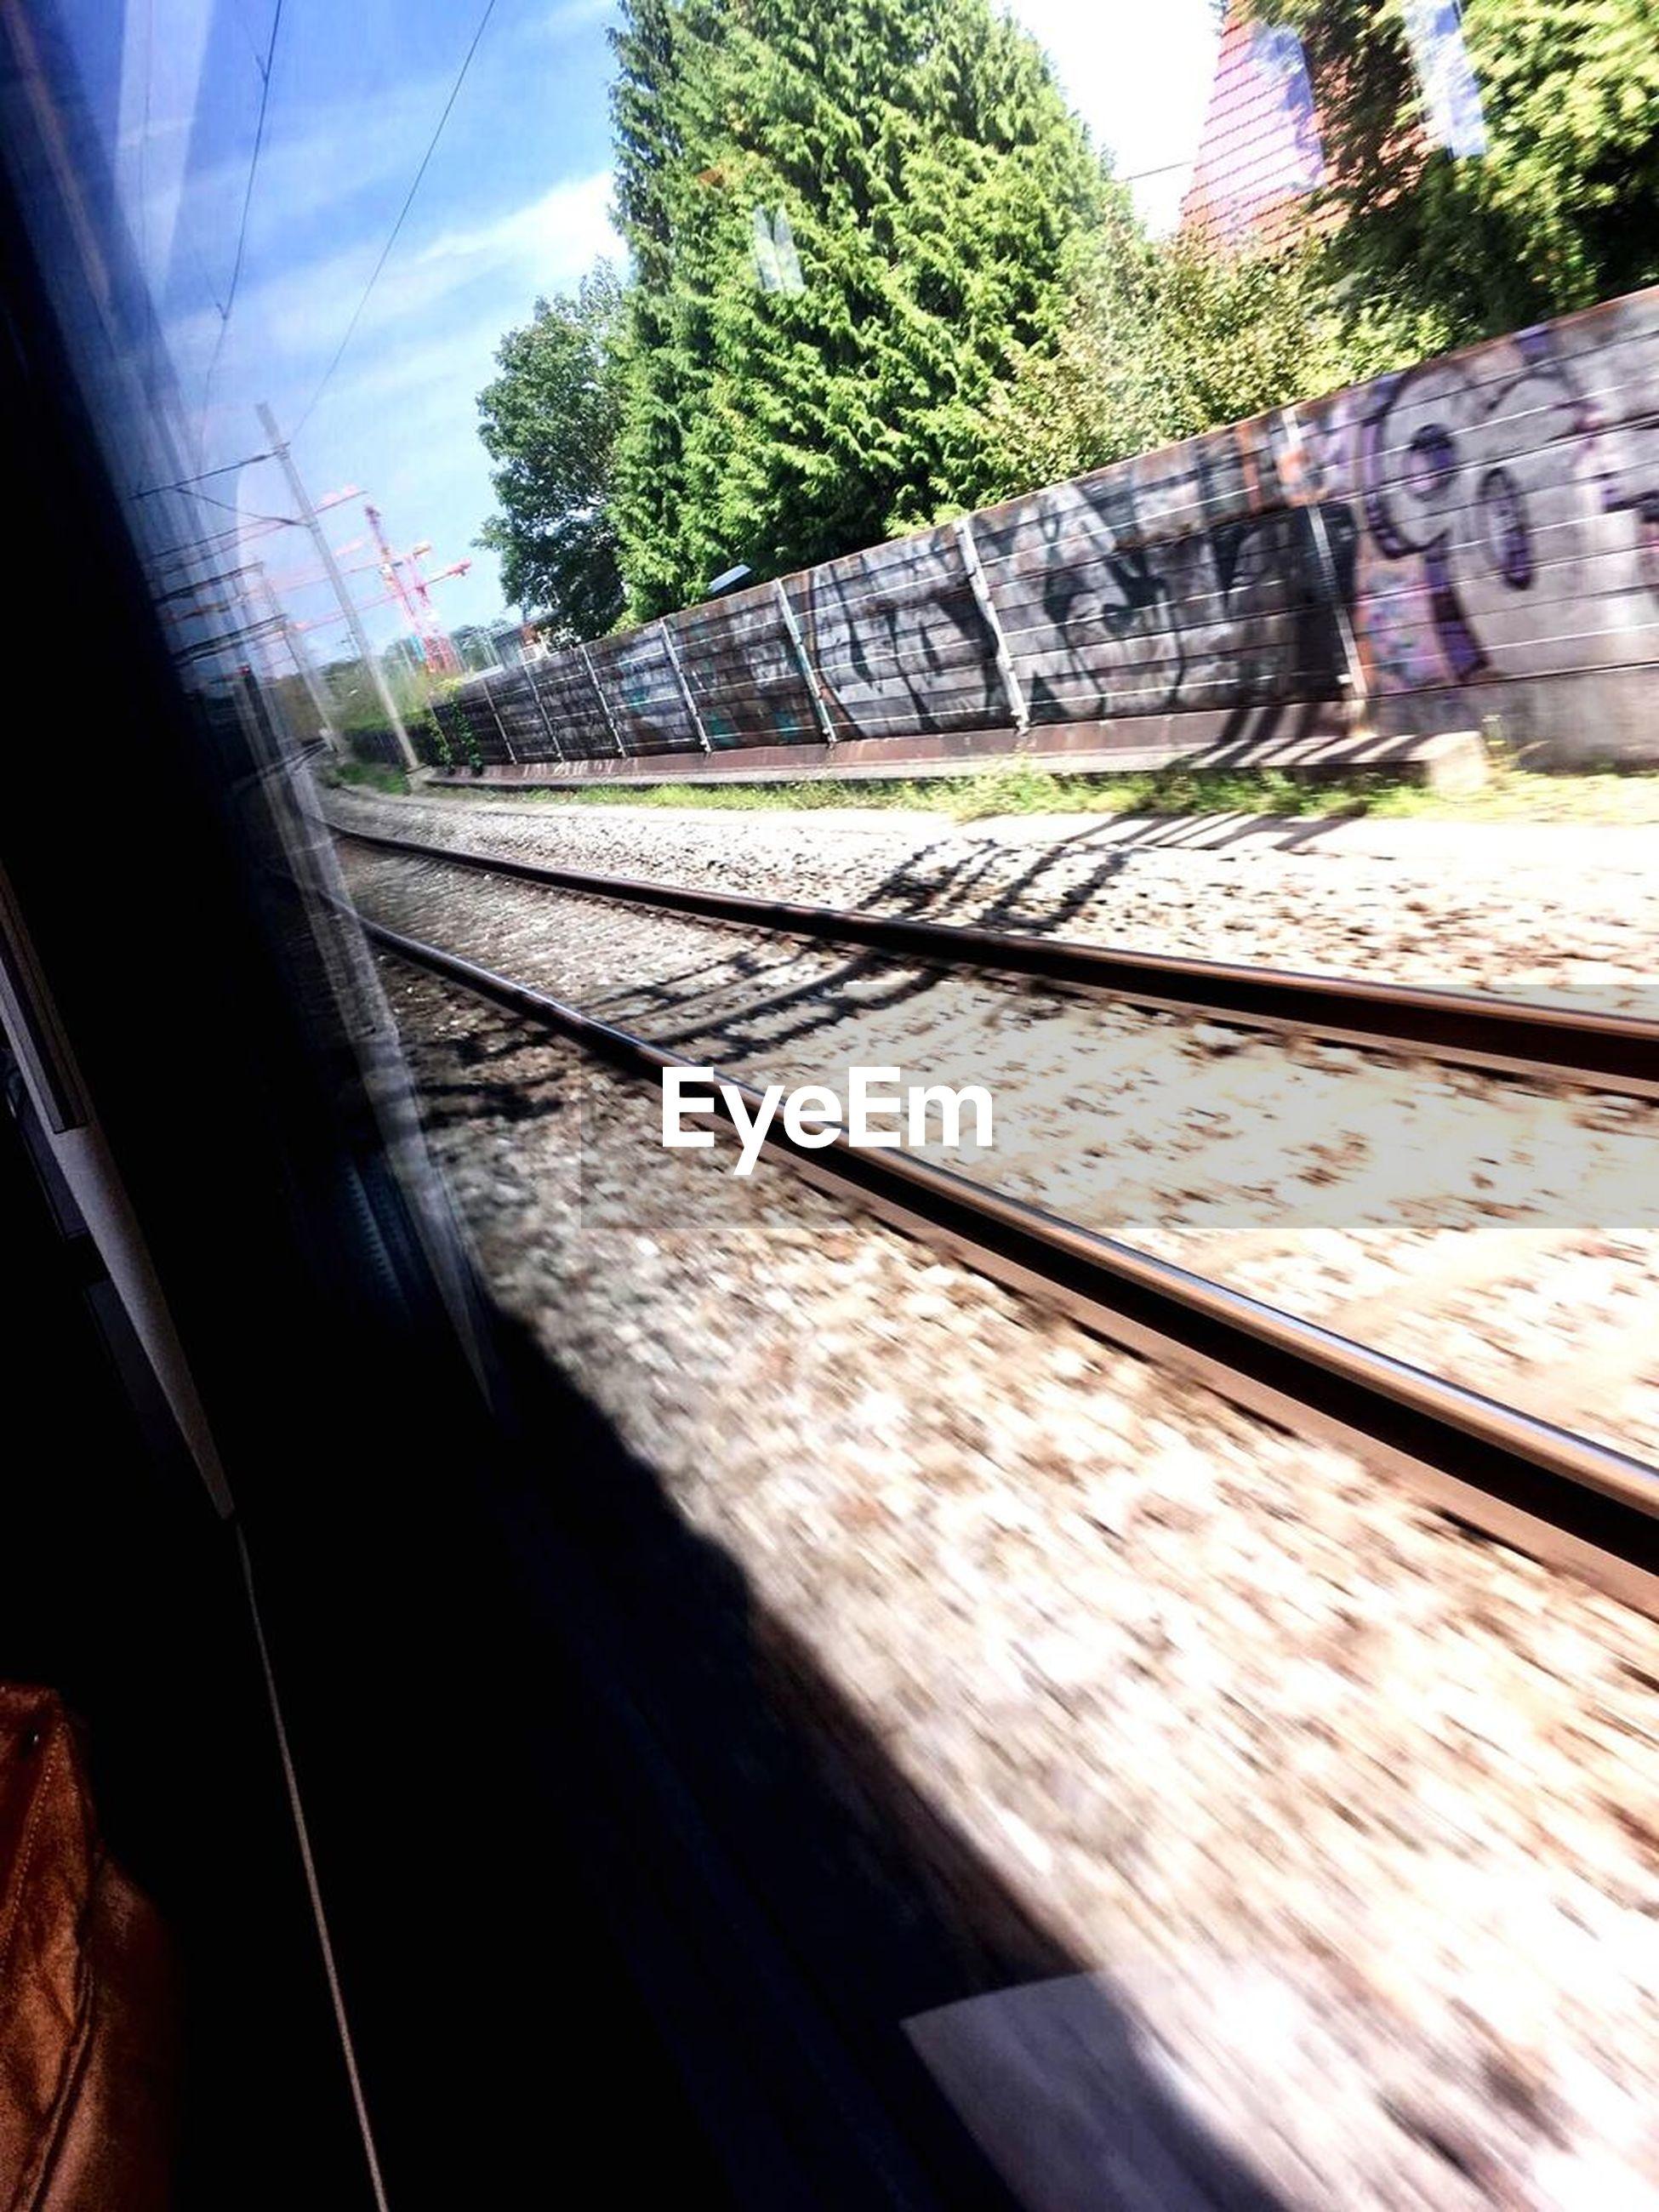 railroad track, rail transportation, transportation, tree, sunlight, day, no people, public transportation, railway track, train - vehicle, railroad, built structure, architecture, outdoors, sky, close-up